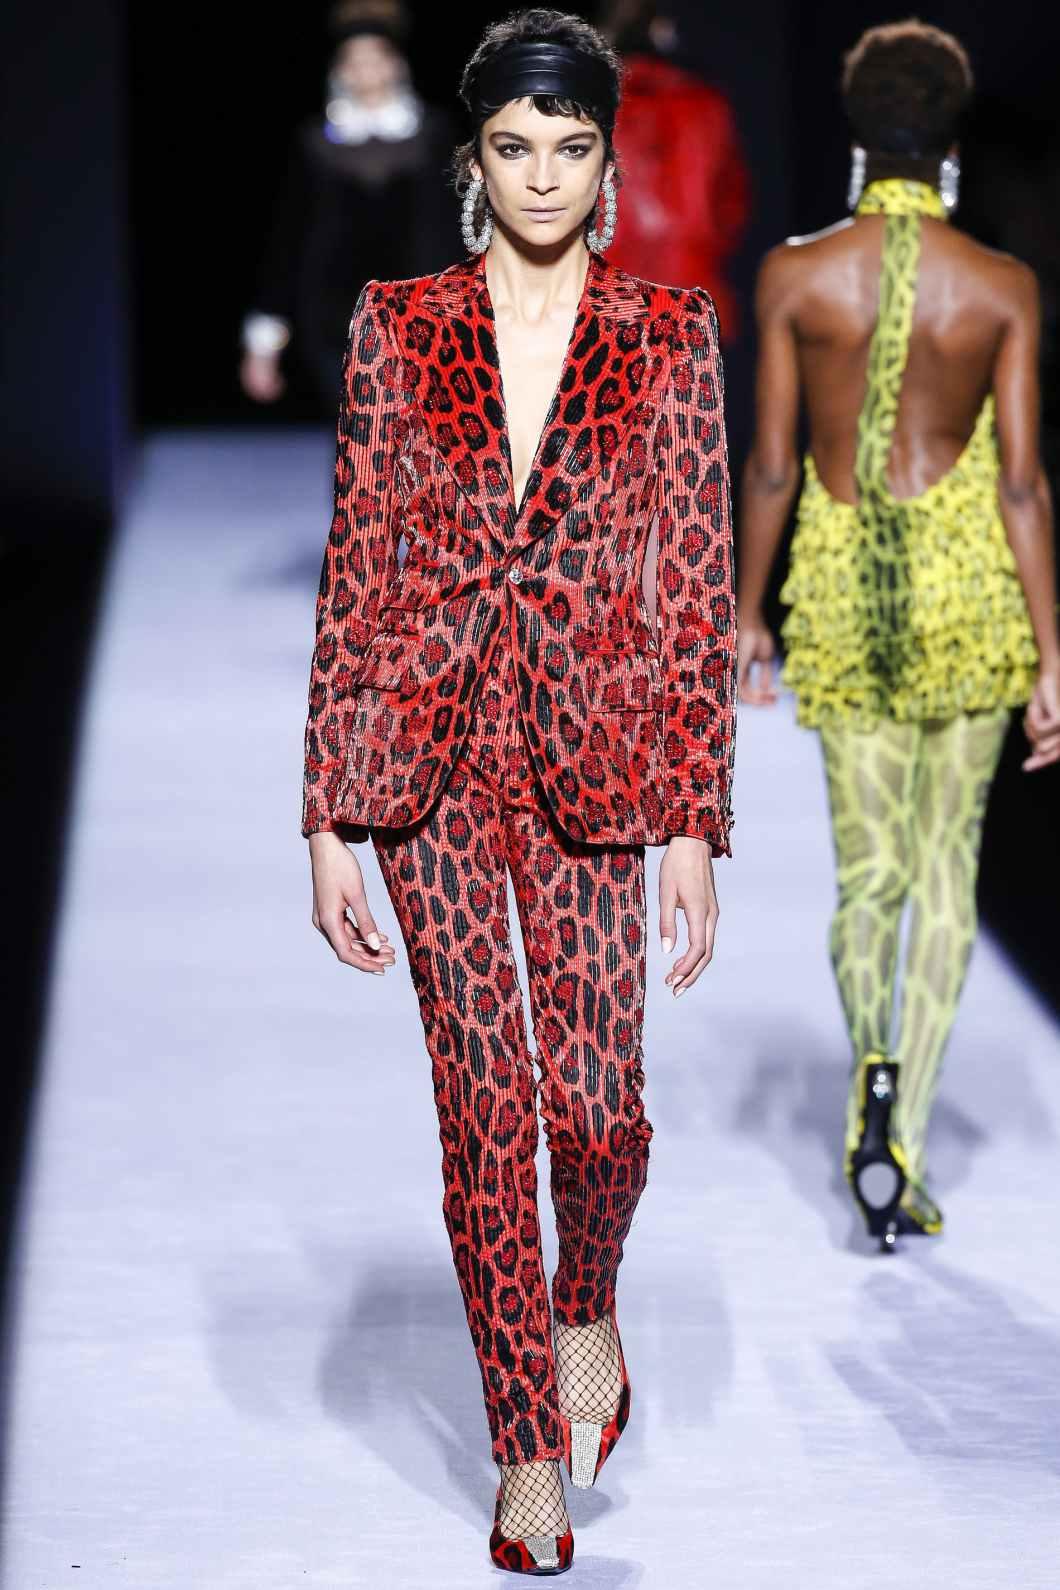 44404873ac98 Animalier, come indossare la moda savage Fall/Winter 2019